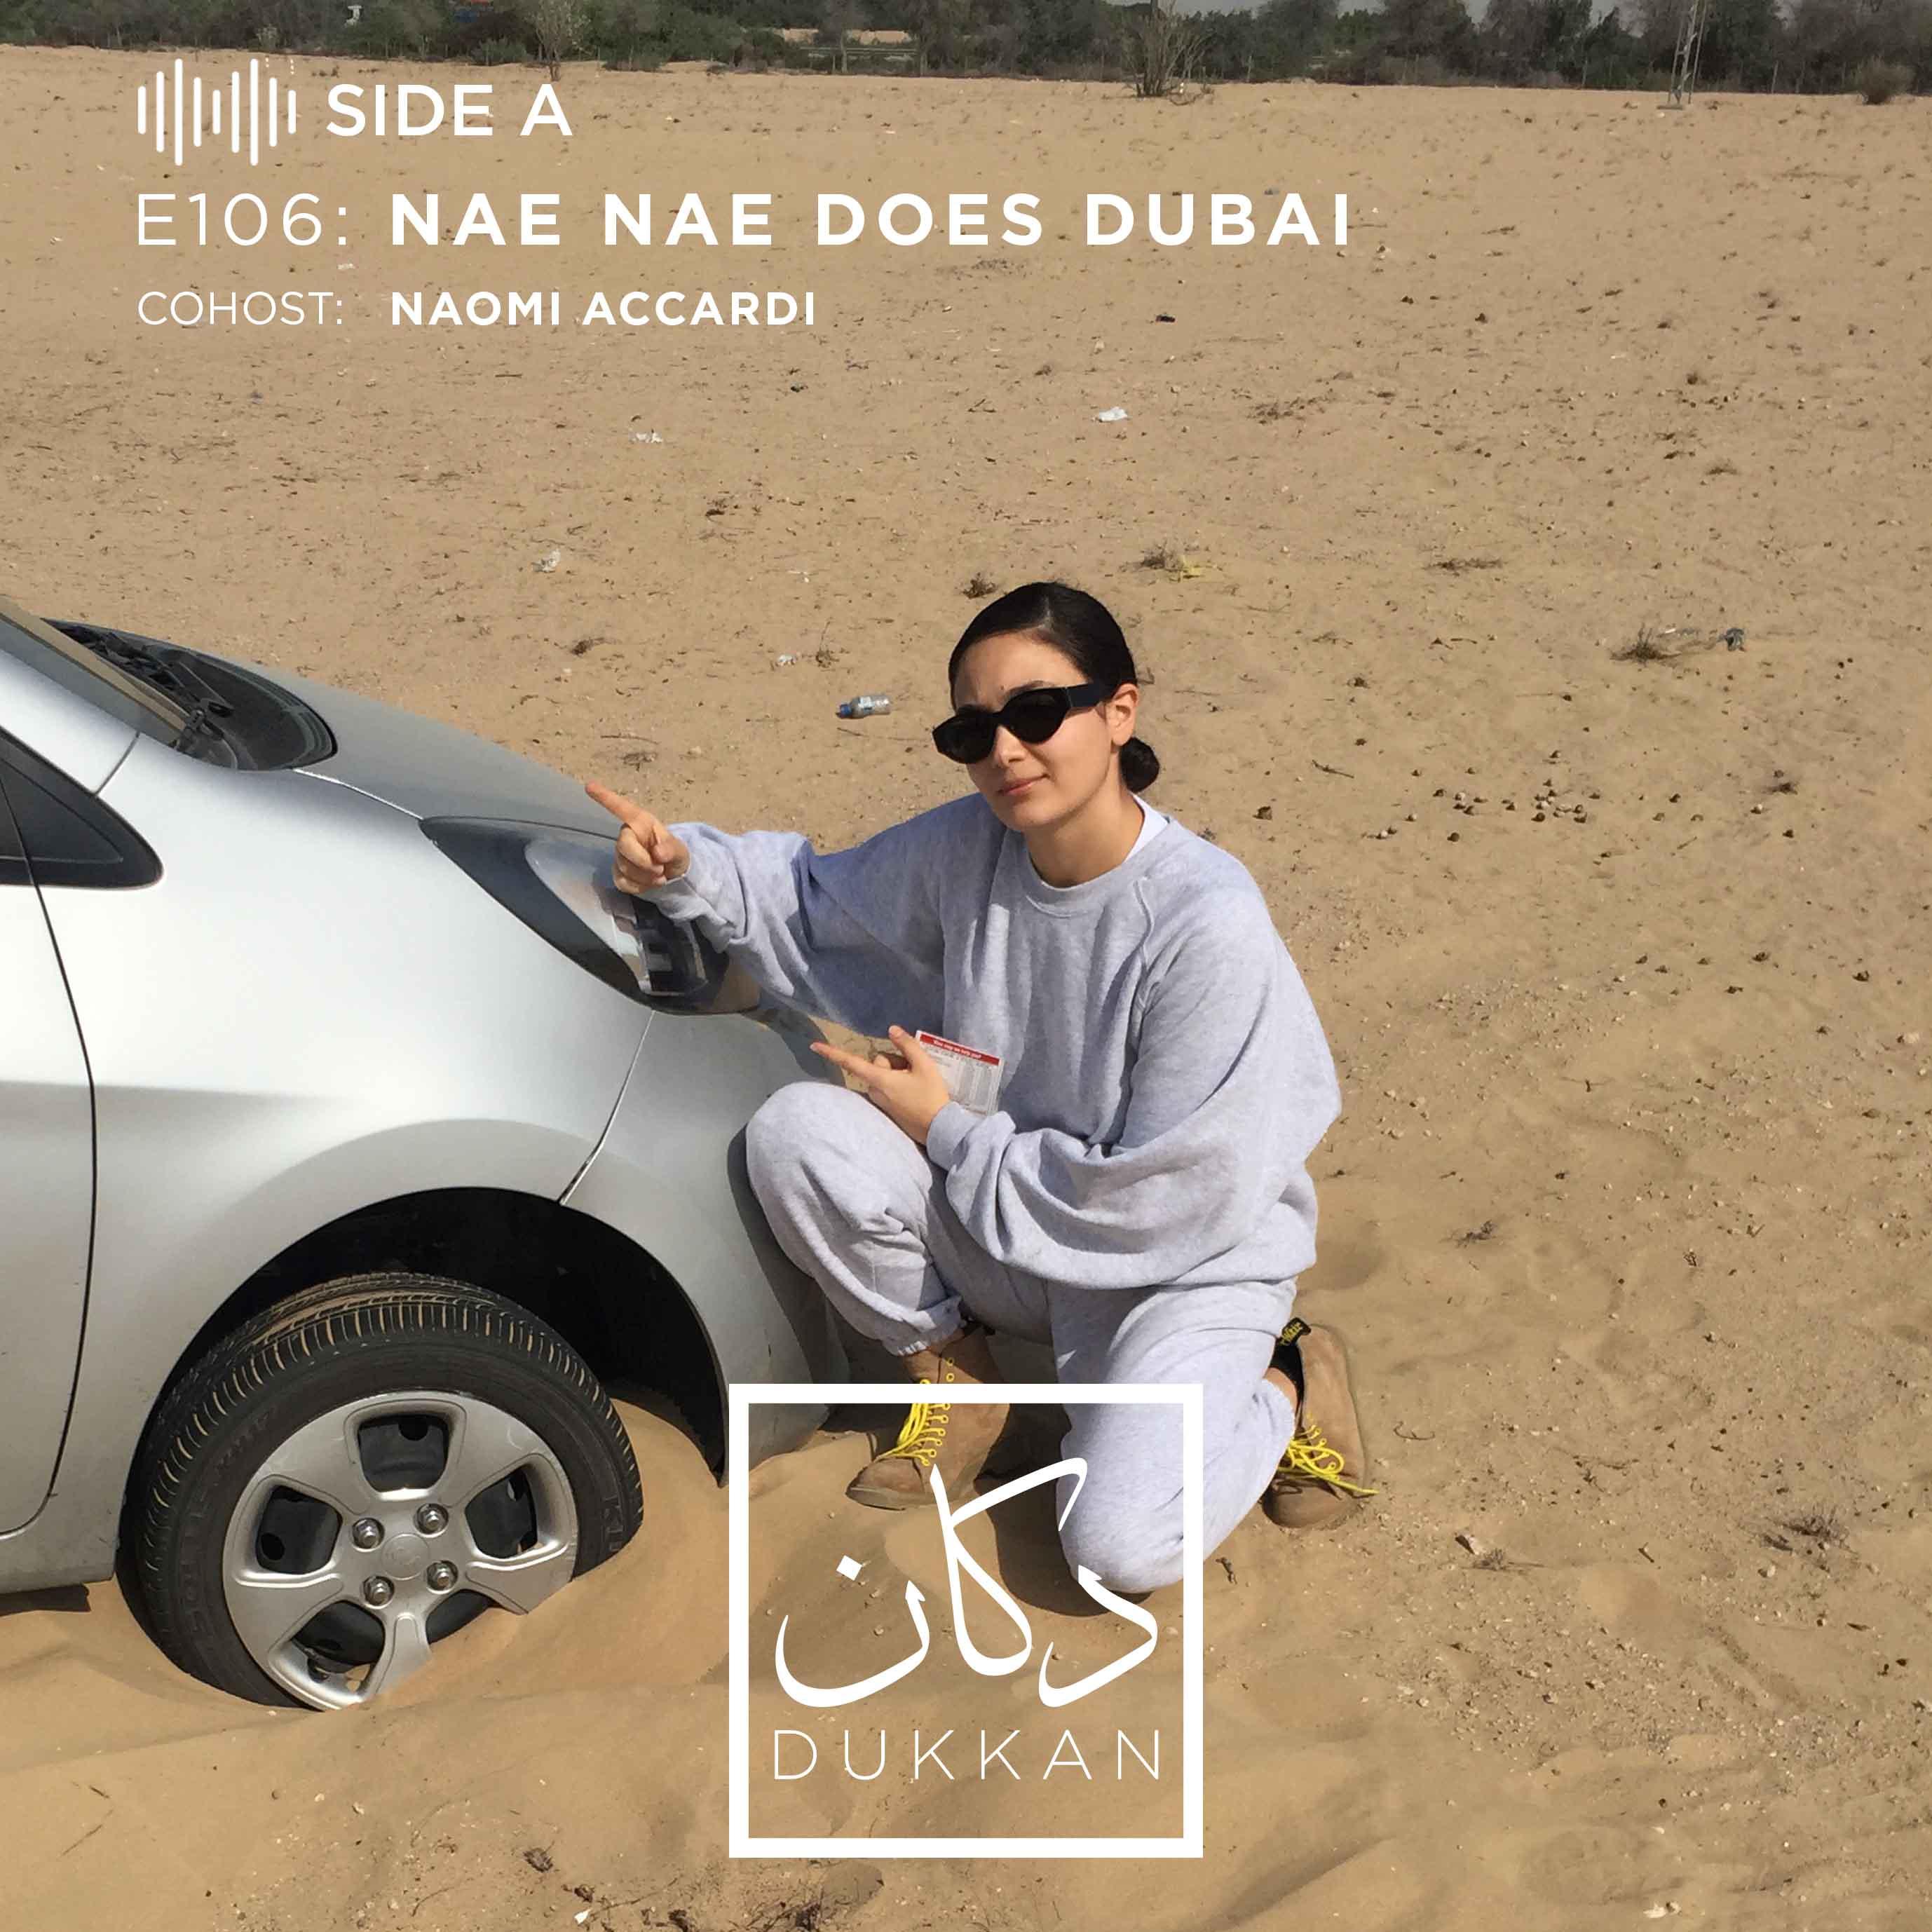 E106 - Side A: Nae Nae Does Dubai (Cohost: Naomi Accardi)